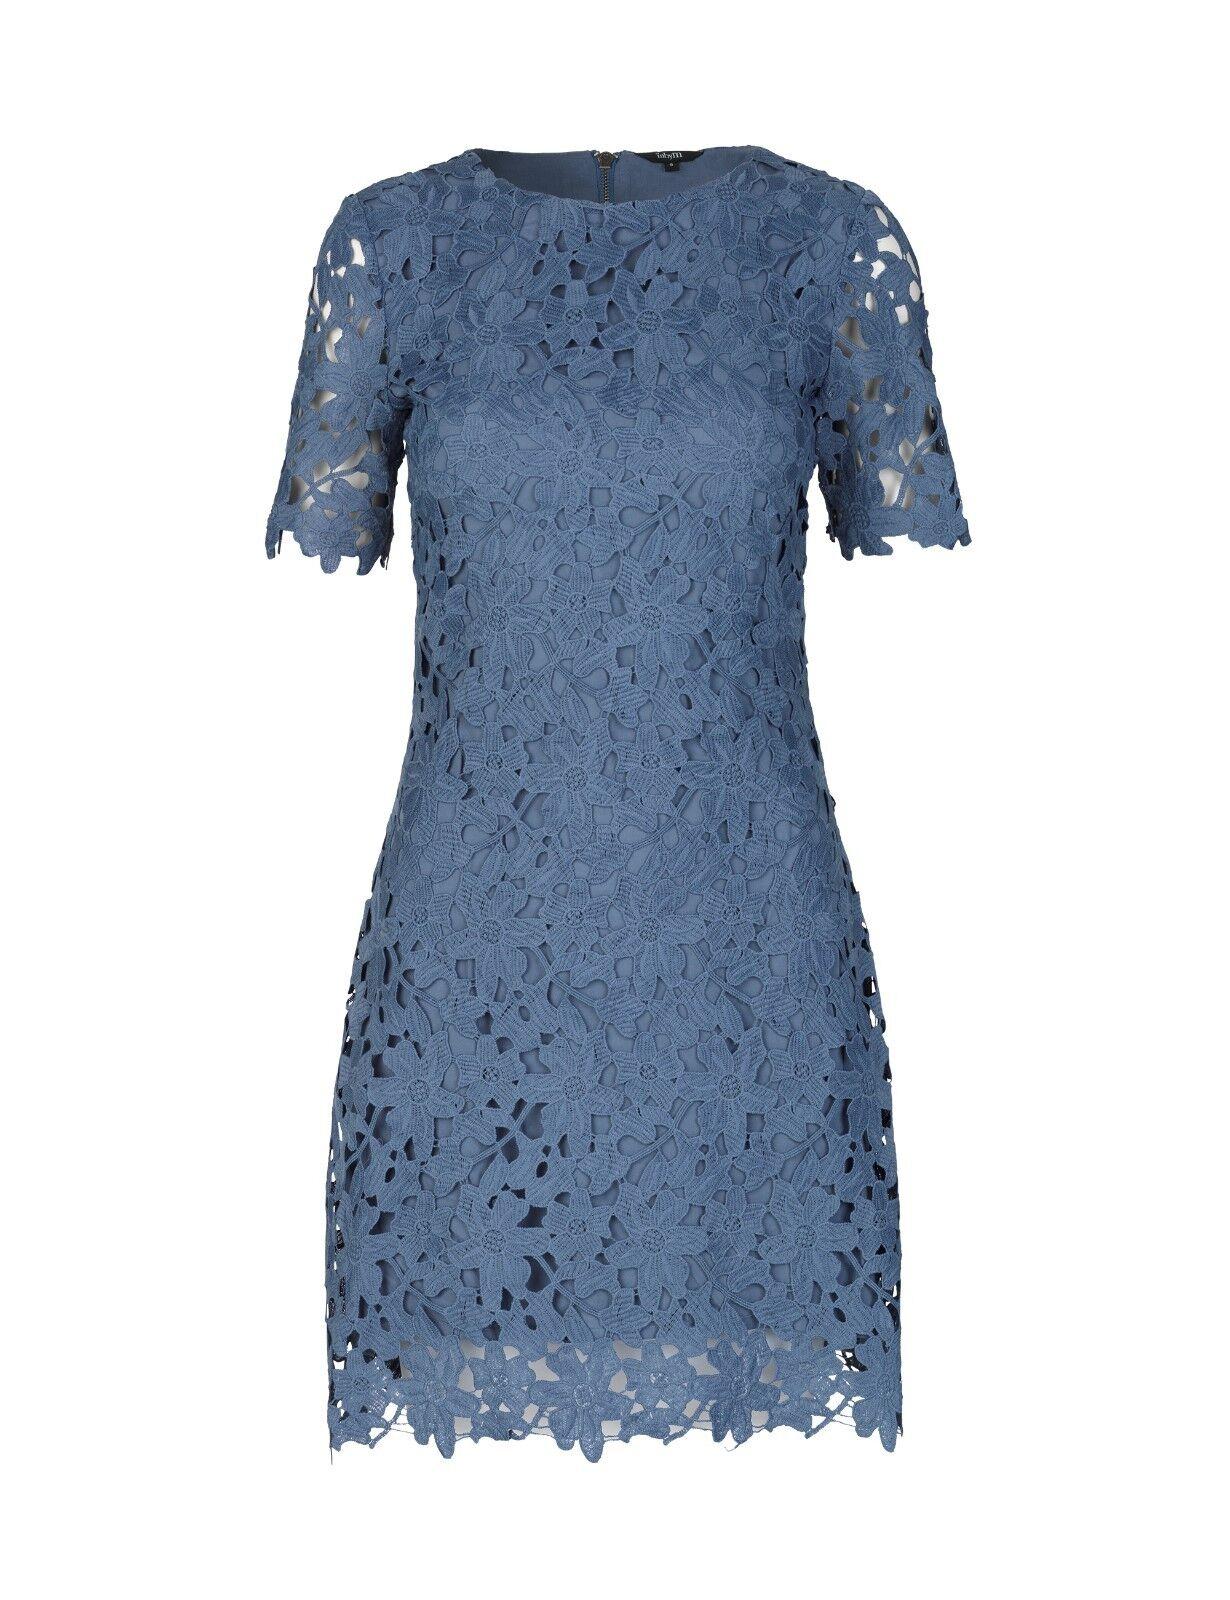 MbyM Georgia Gene Crochet Lace Midi Dress Large BNWT RRP 131.95 Shower bluee